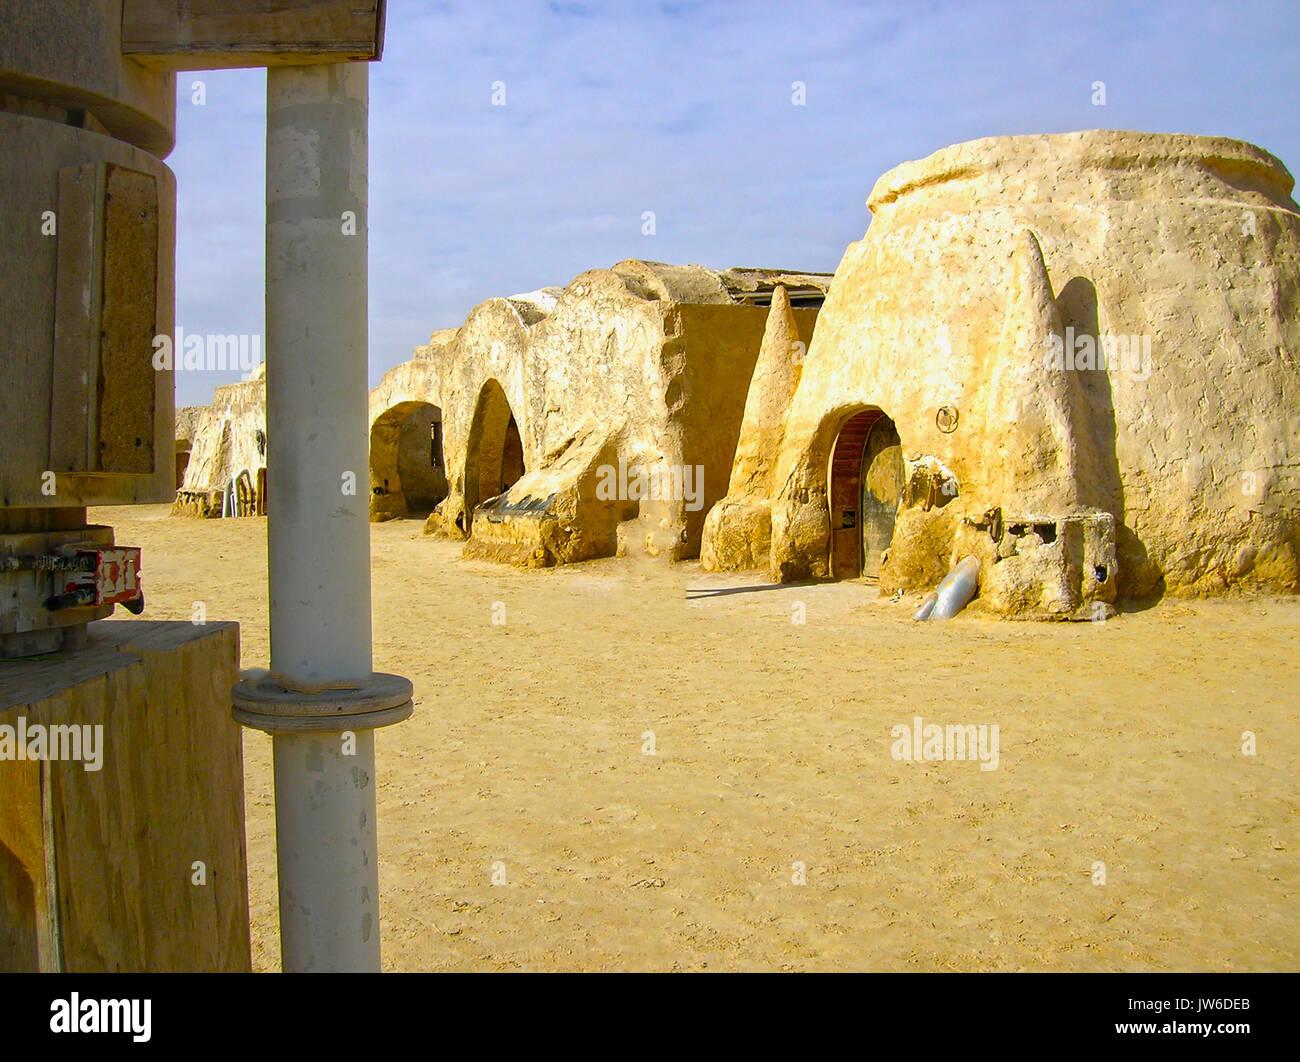 Sahara, Tunisia - January 03, 2008: Abandoned sets for the shooting of the movie Star Wars Stock Photo